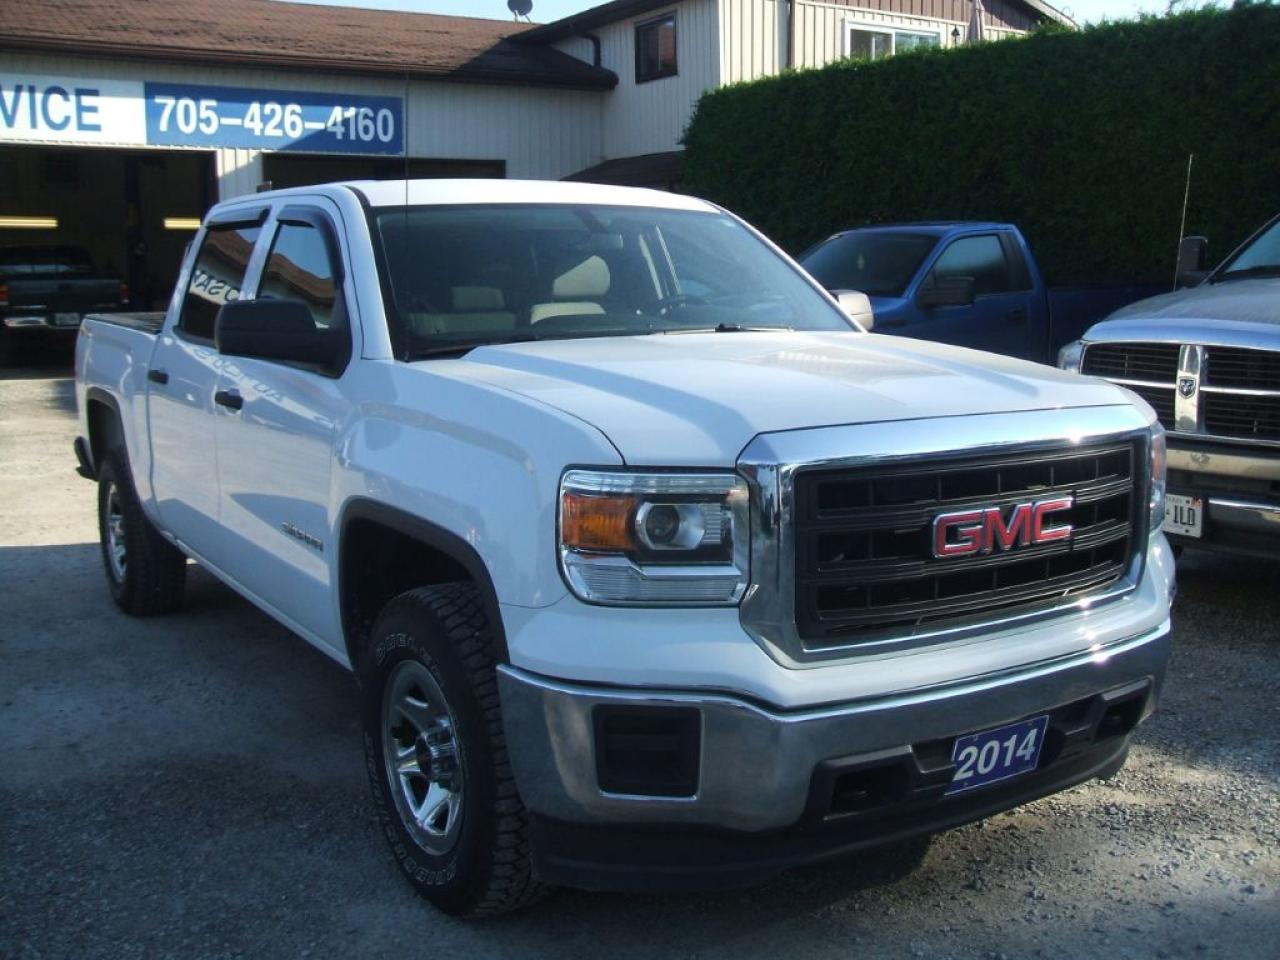 Photo of White 2014 GMC Sierra 1500